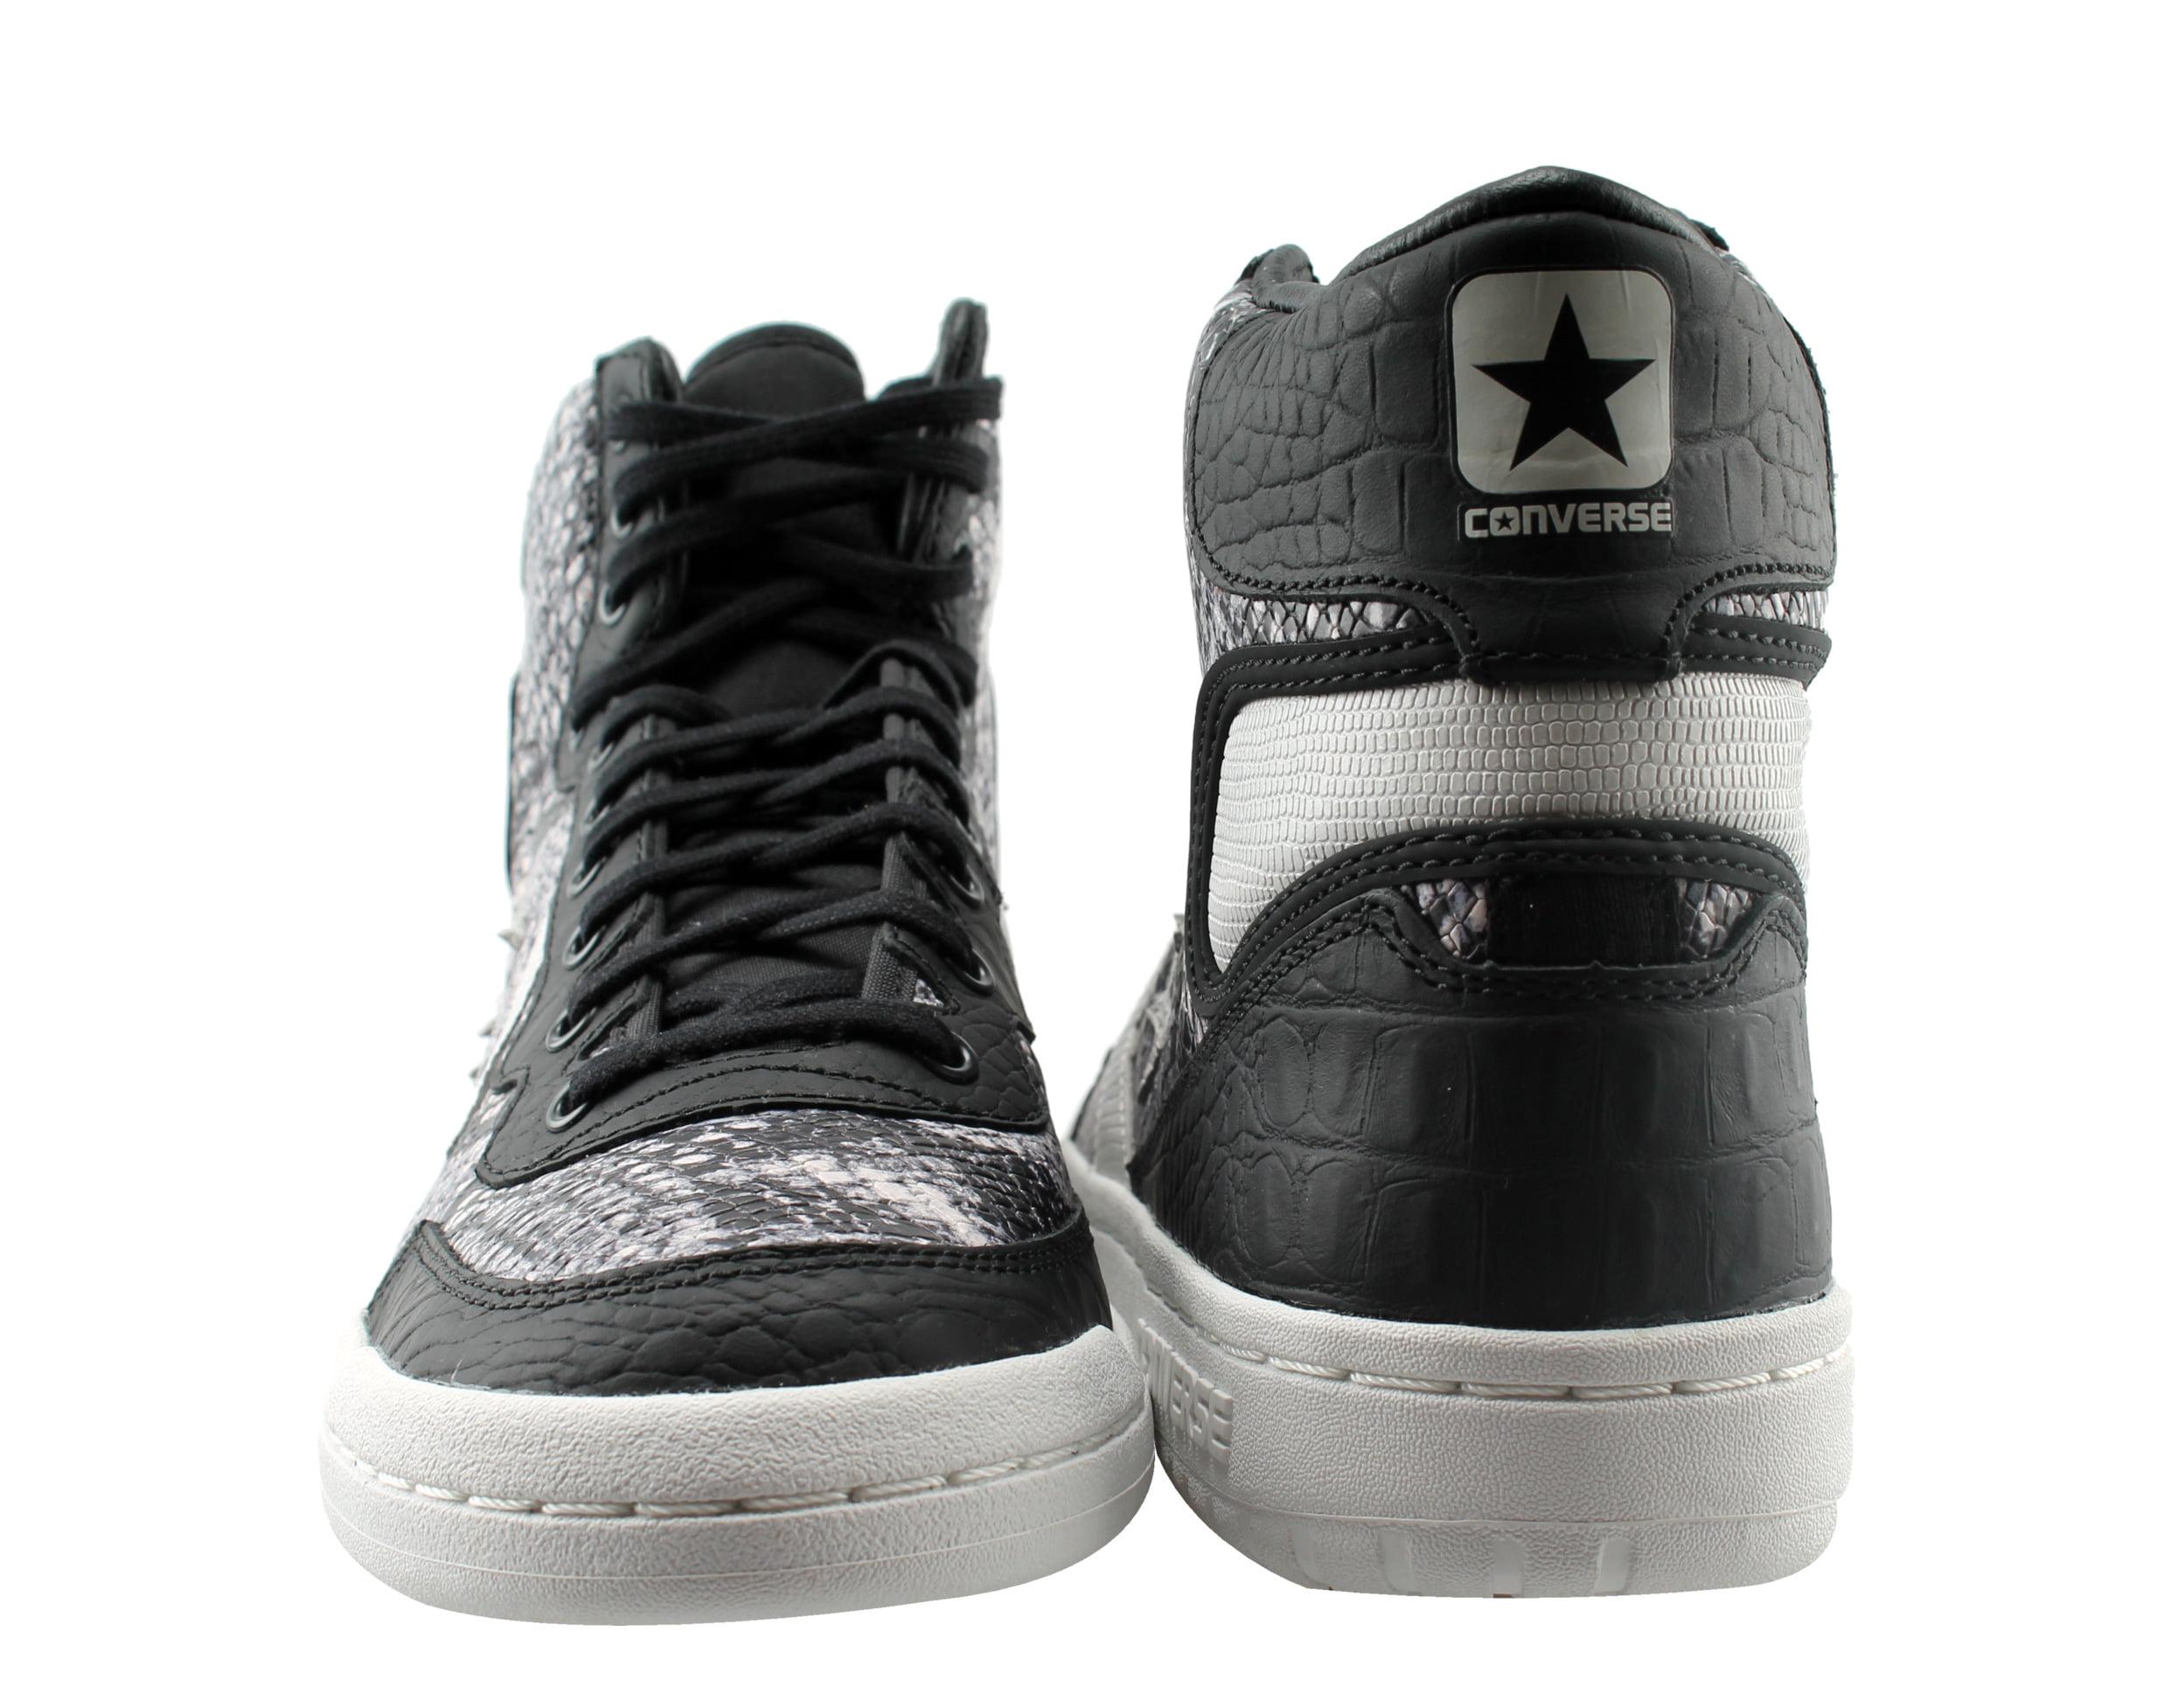 Converse Converse Fastbreak Hi Black Snake Men's Sneakers